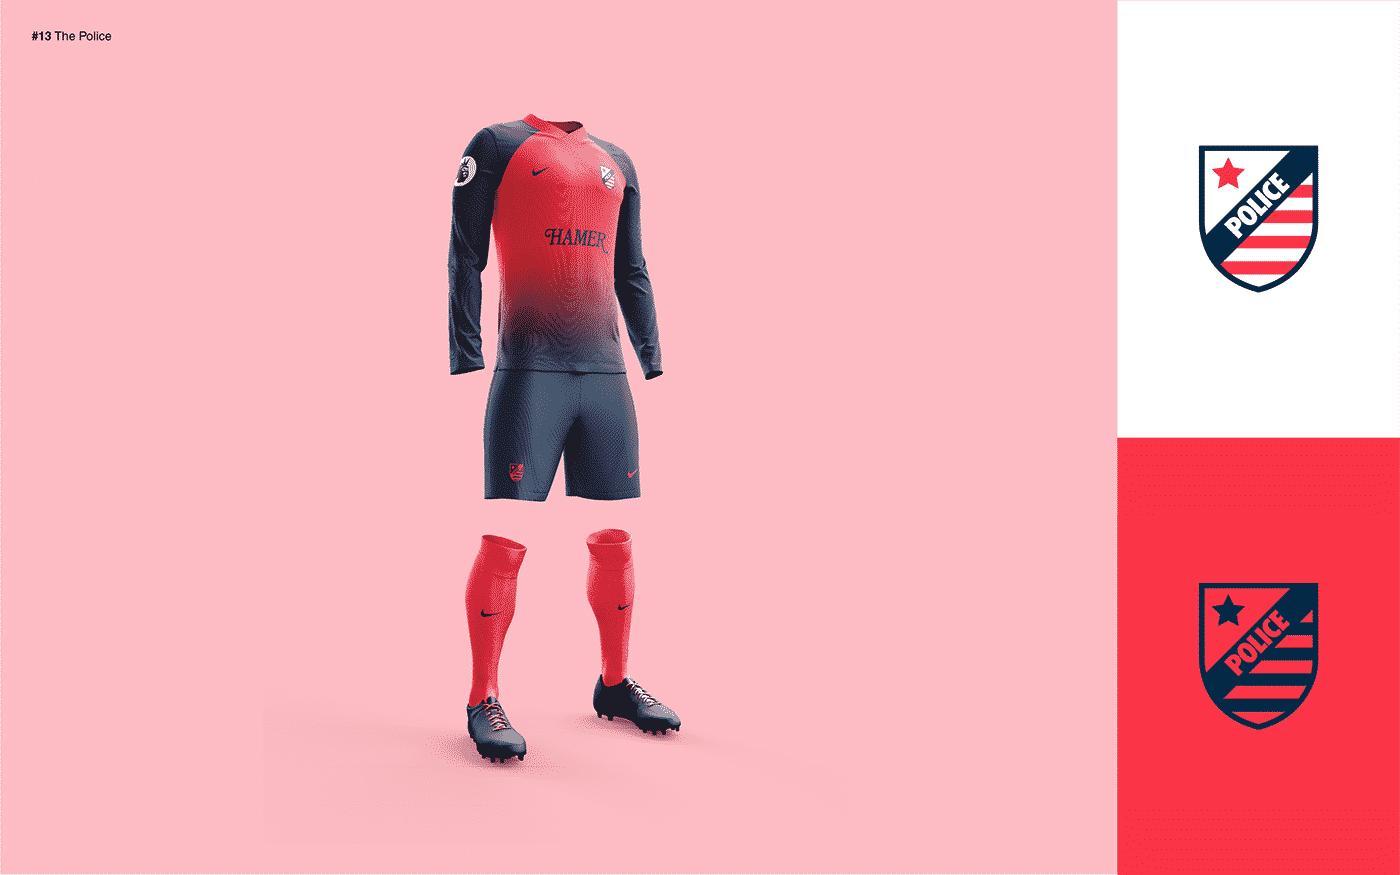 Premier-League-2018-Rock-Edition-Matheus-de-Souza-Viana-Police-img1